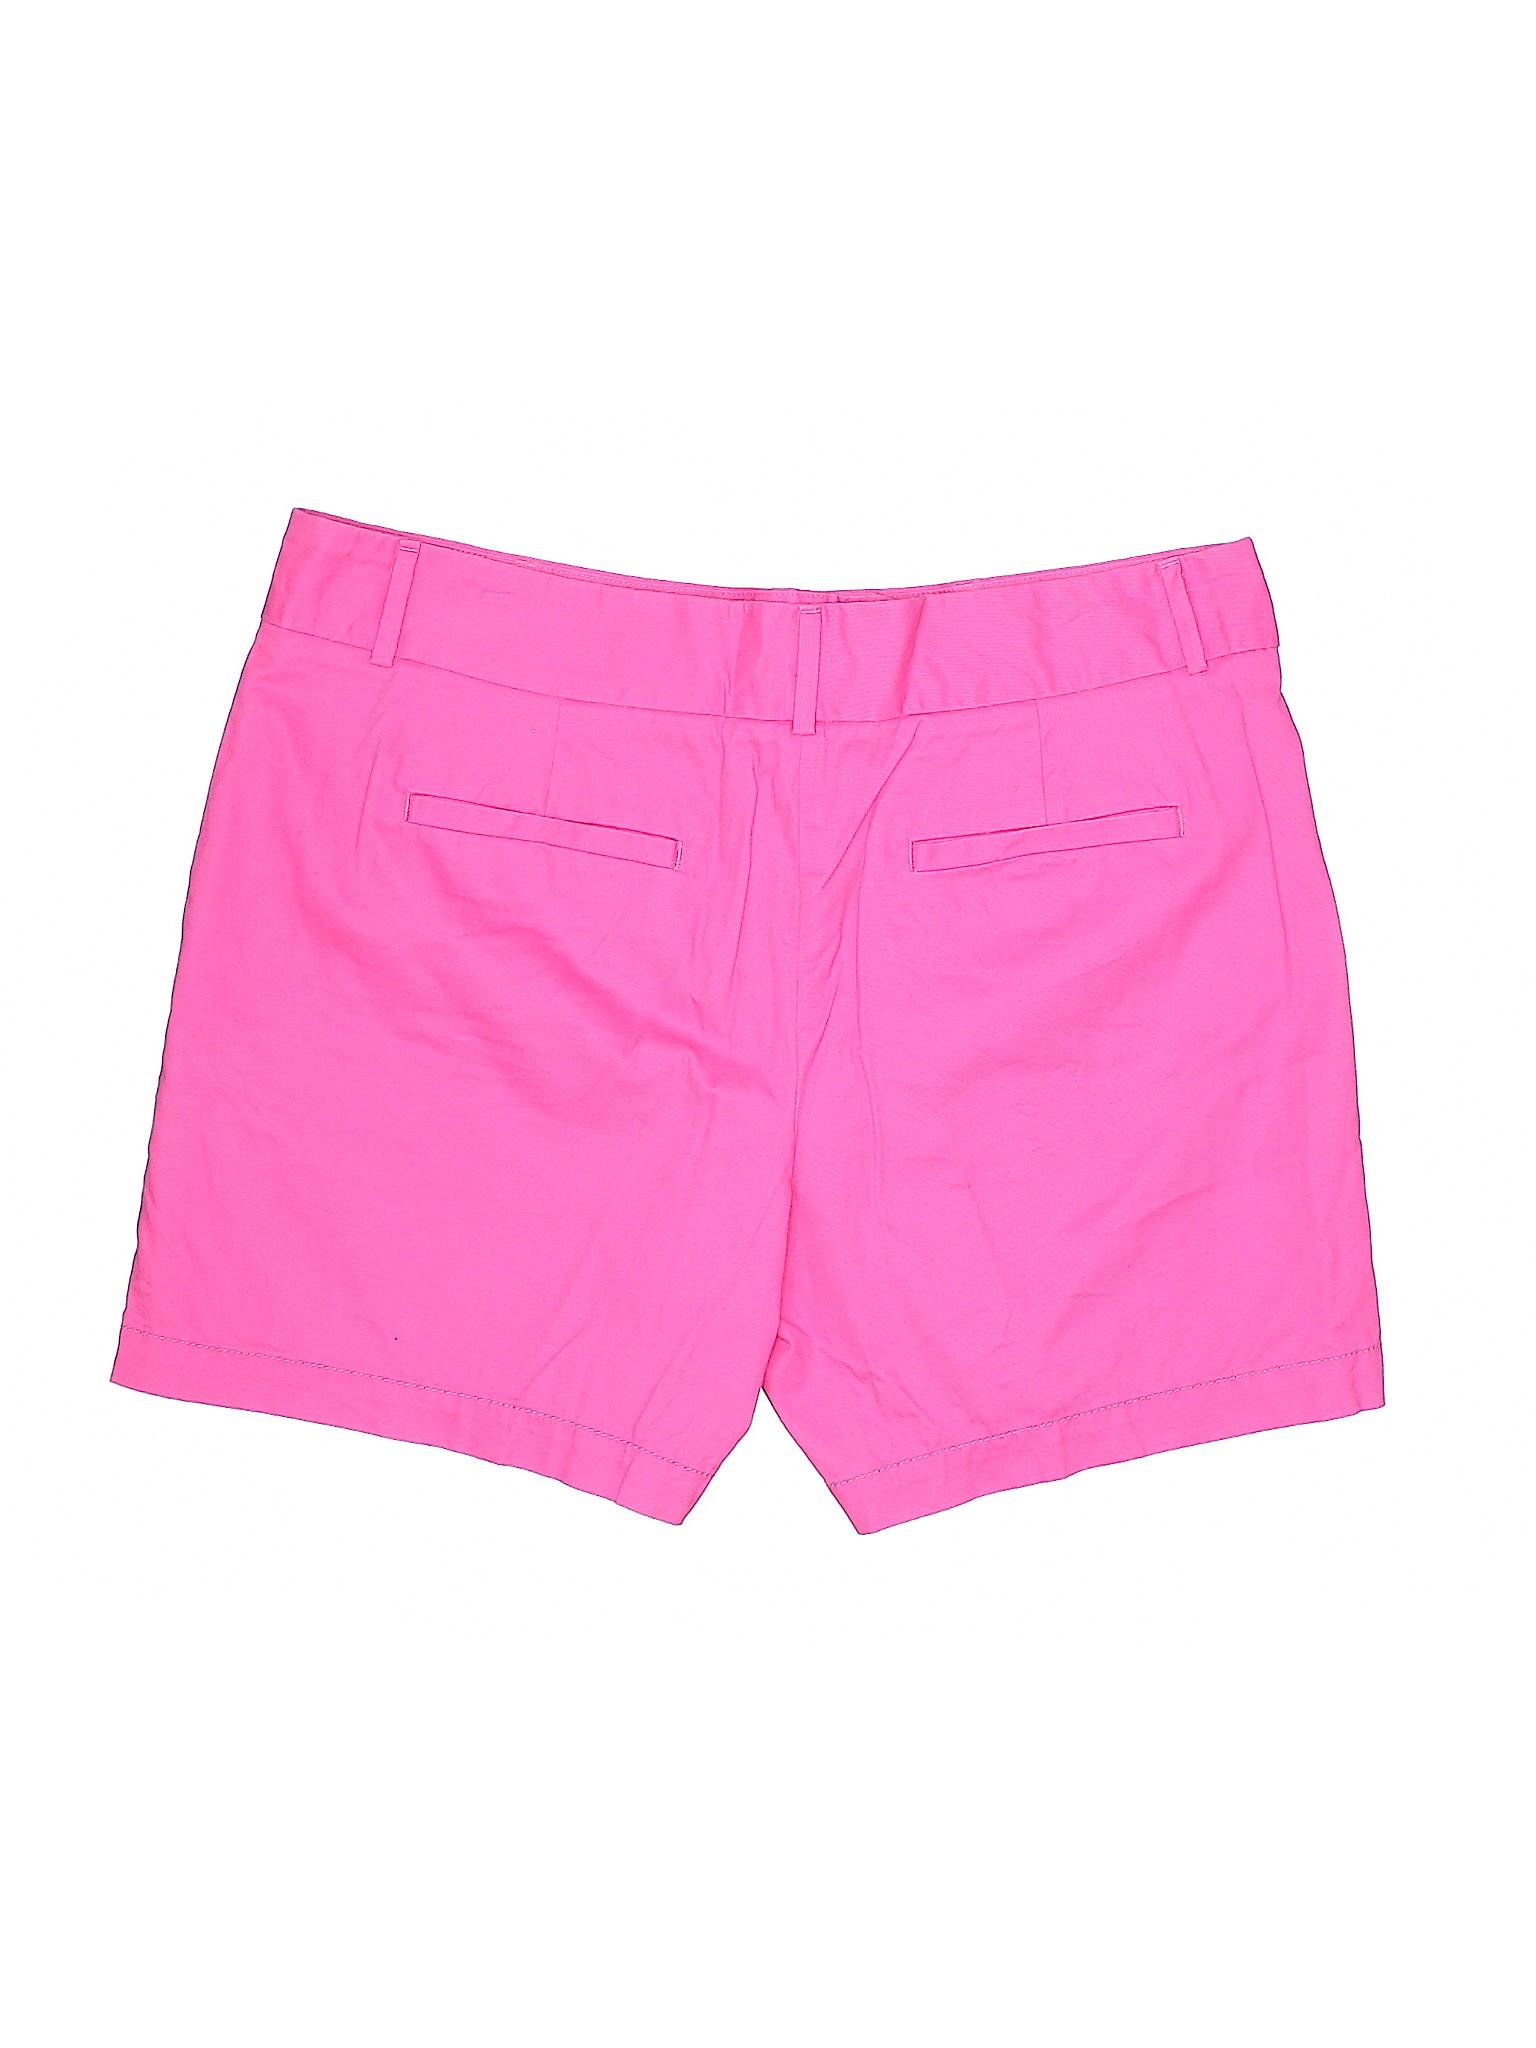 Khaki Boutique Taylor Ann leisure LOFT Shorts 8f6BqwU